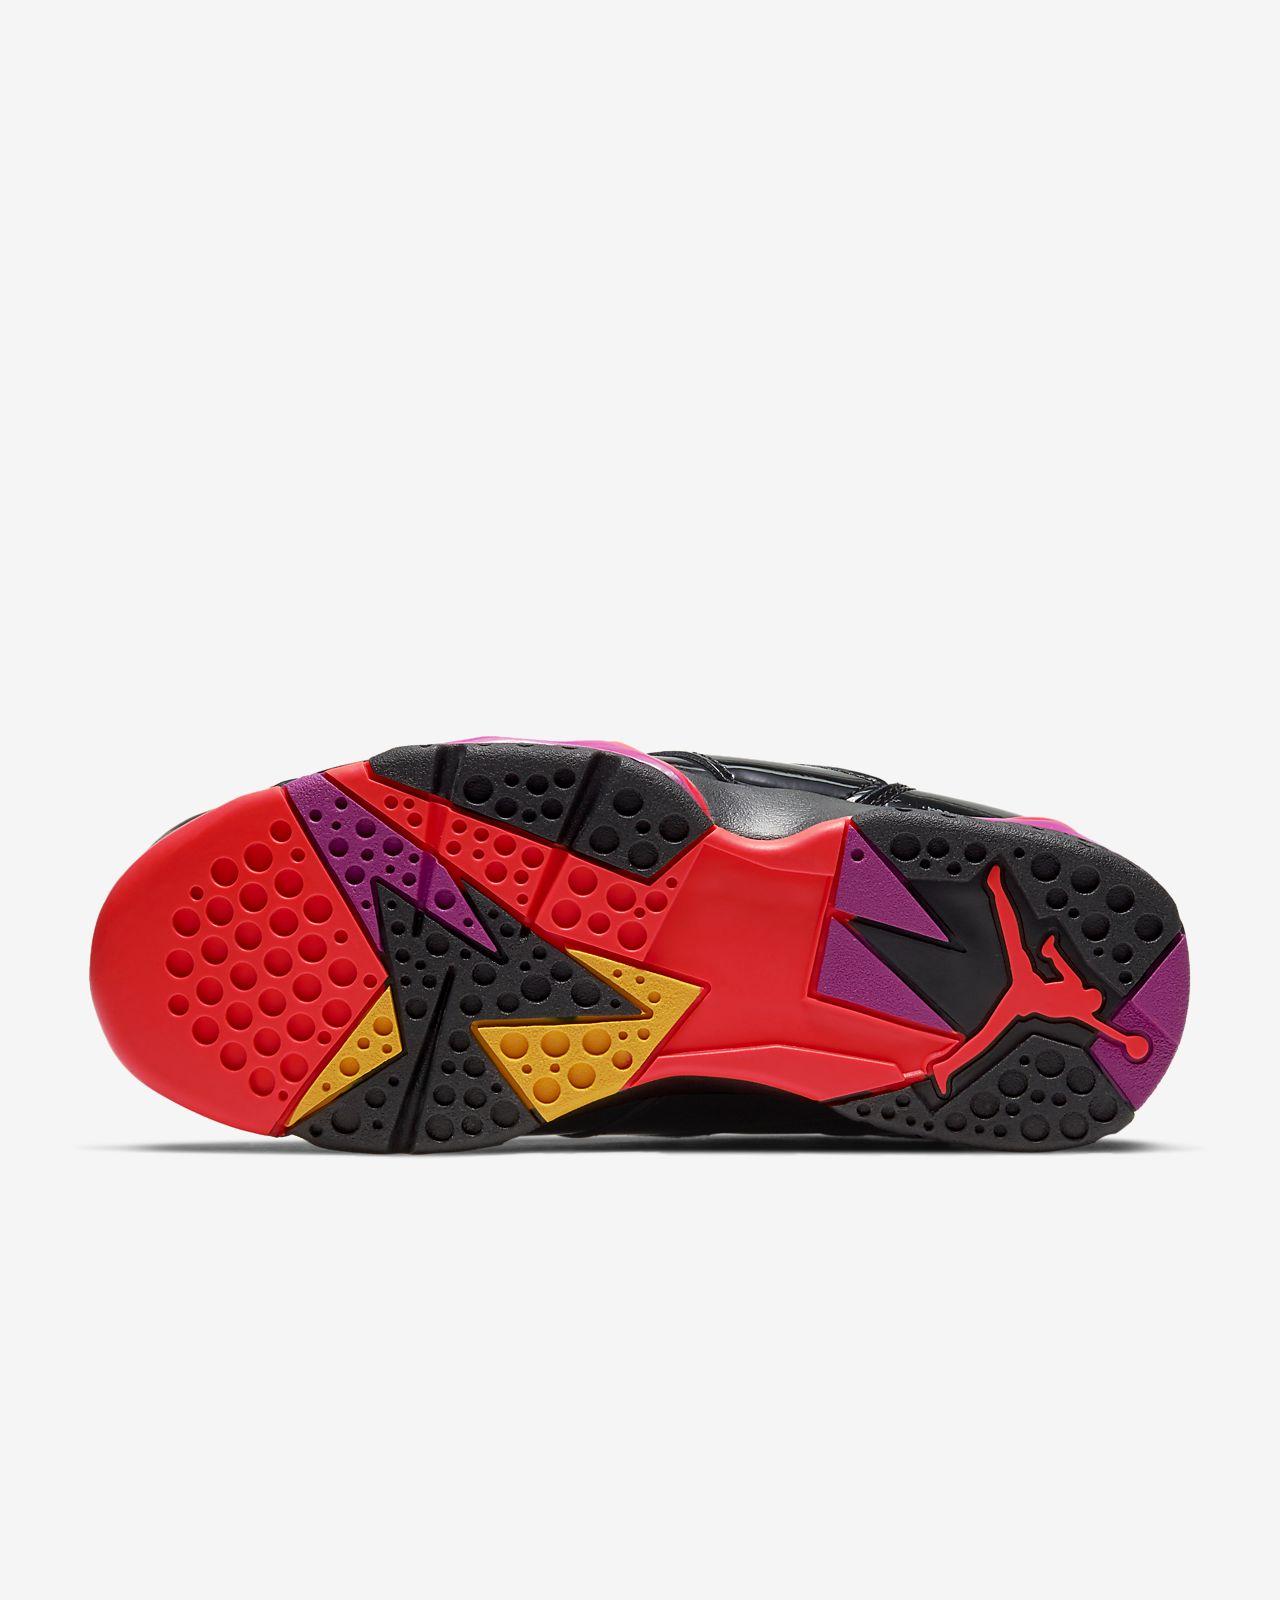 Air Jordan 7 Retro 女鞋